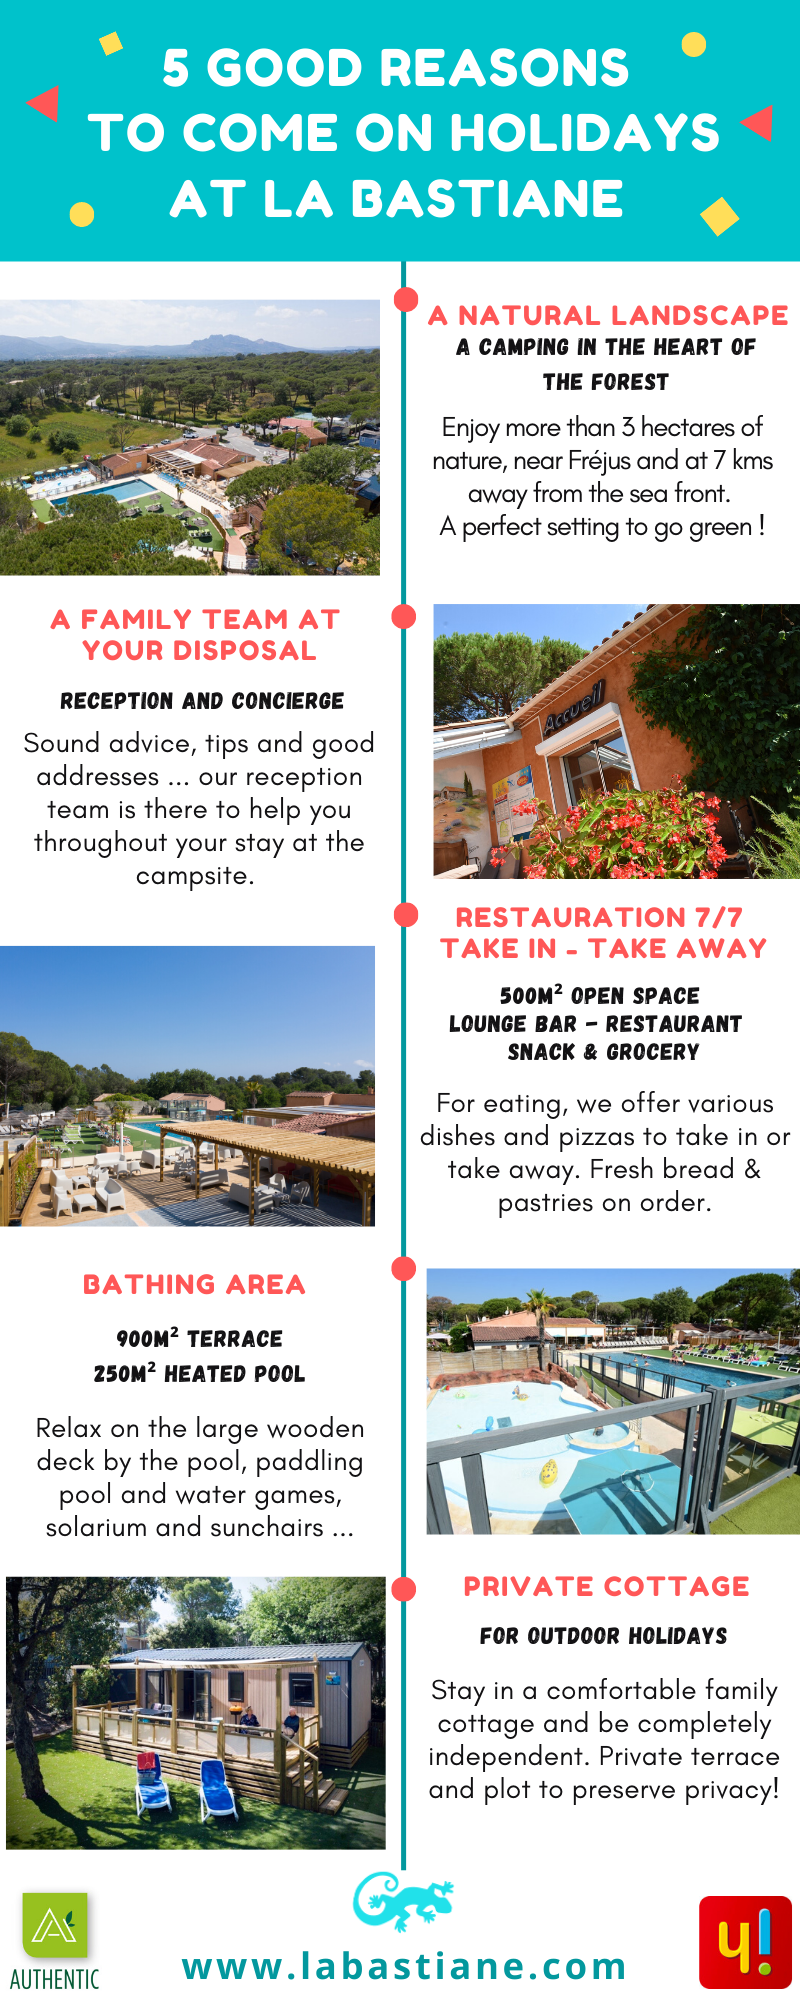 5 good reasons to come at la bastiane